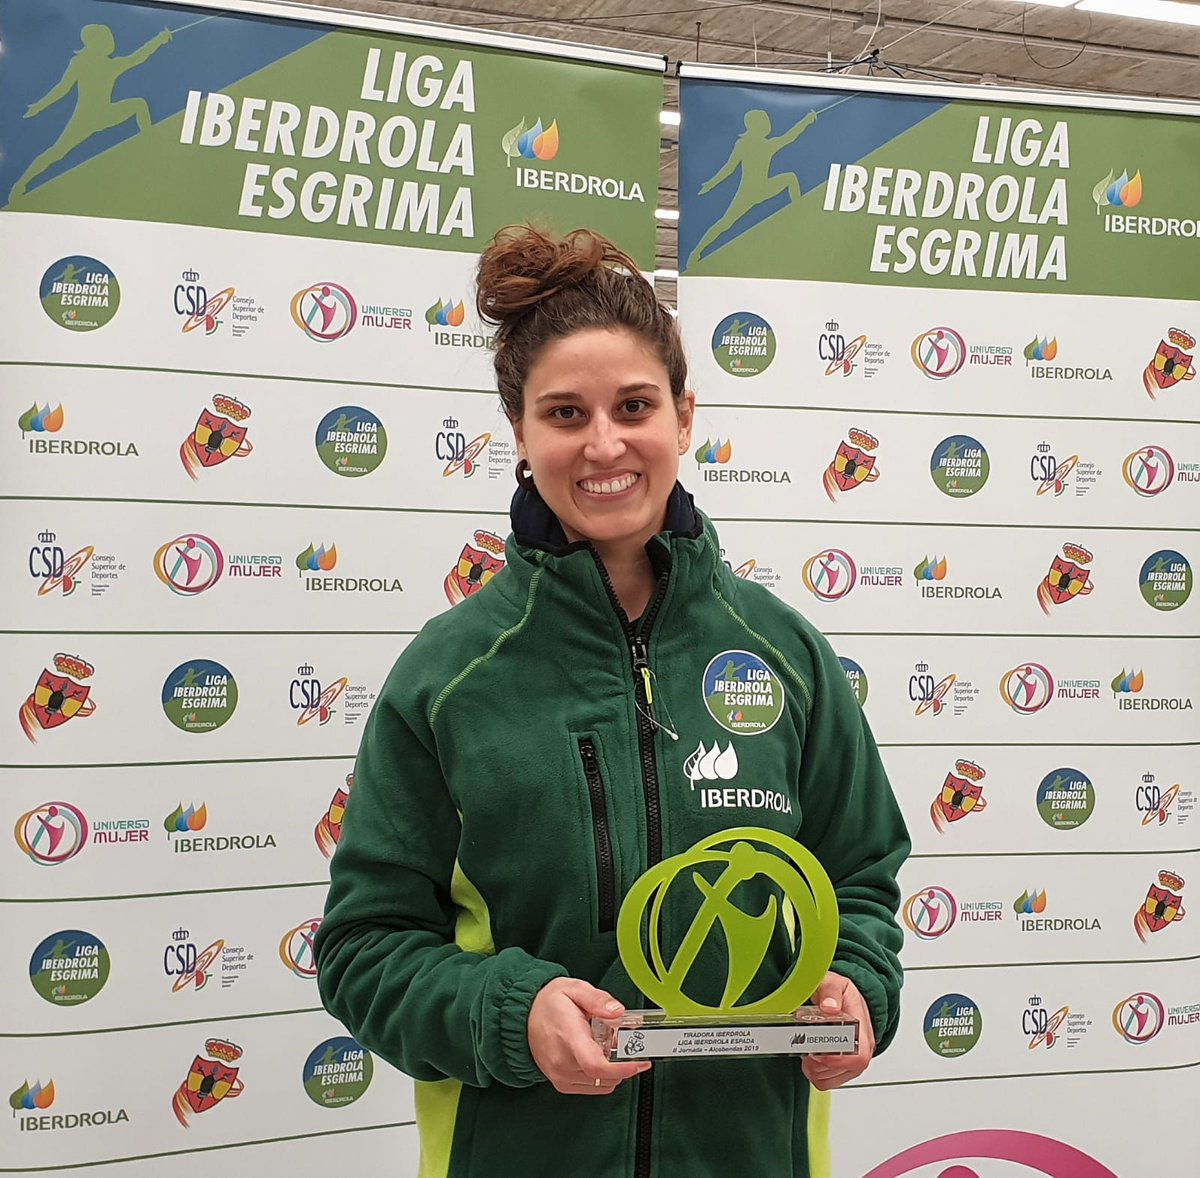 🤺 Lucía Martín-Portugués, Araceli Navarro, Celia Pérez y Laia Vila viajan hasta El Cairo (Egipto) para competir en el primer Grand Prix (22-24 febrero) de sable femenino de la temporada. 📸 @rfeEsgrima #ESPasion